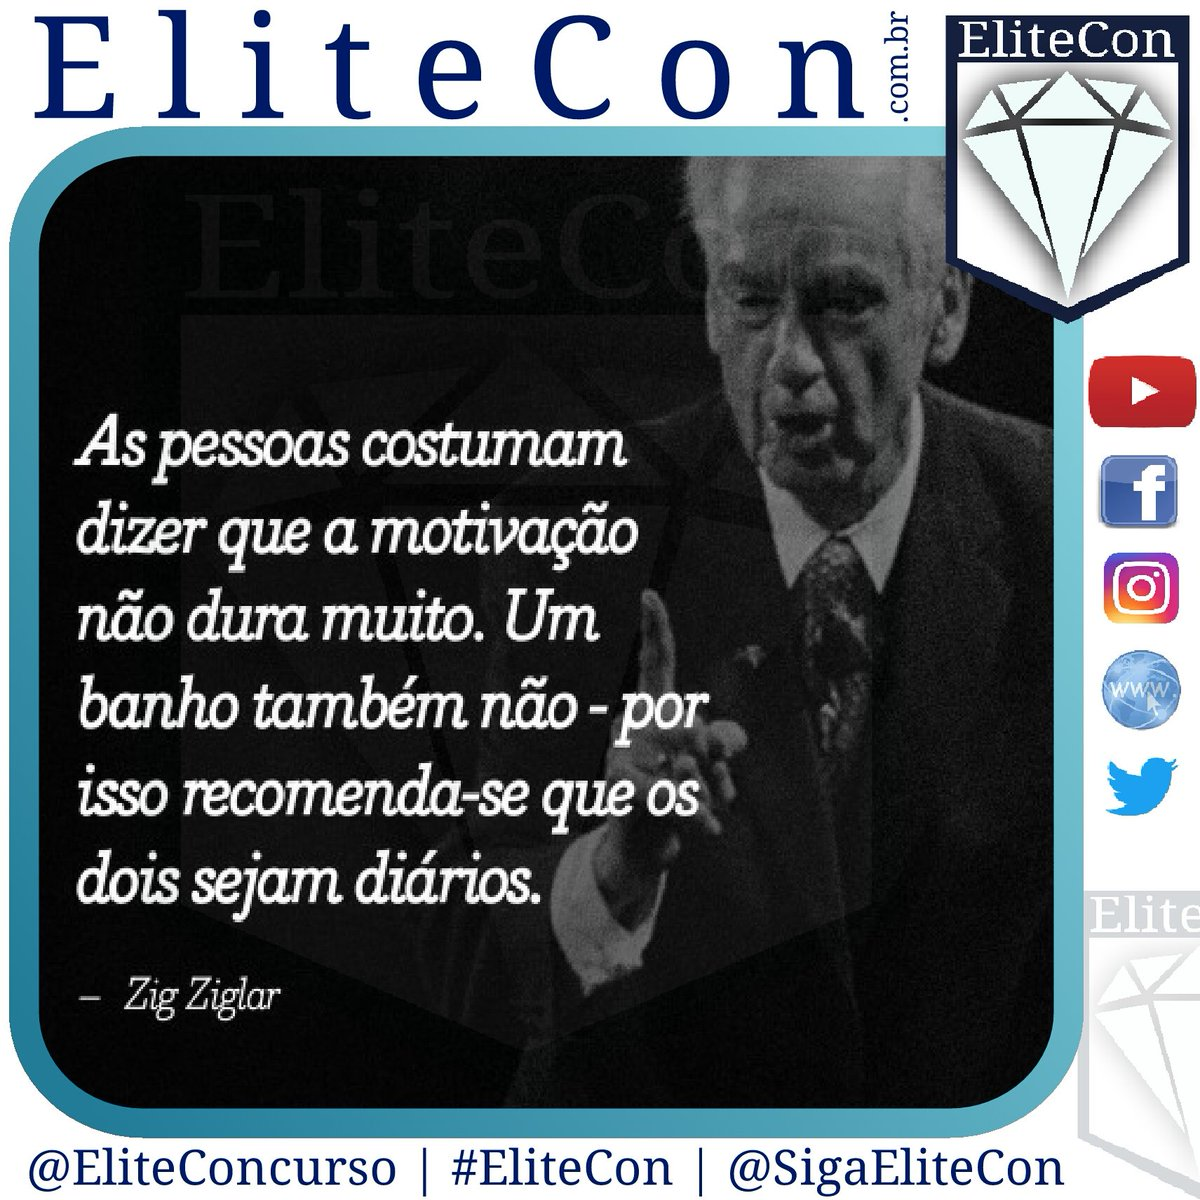 Elite Concurso Elitecon Eliteconcurso Twitter